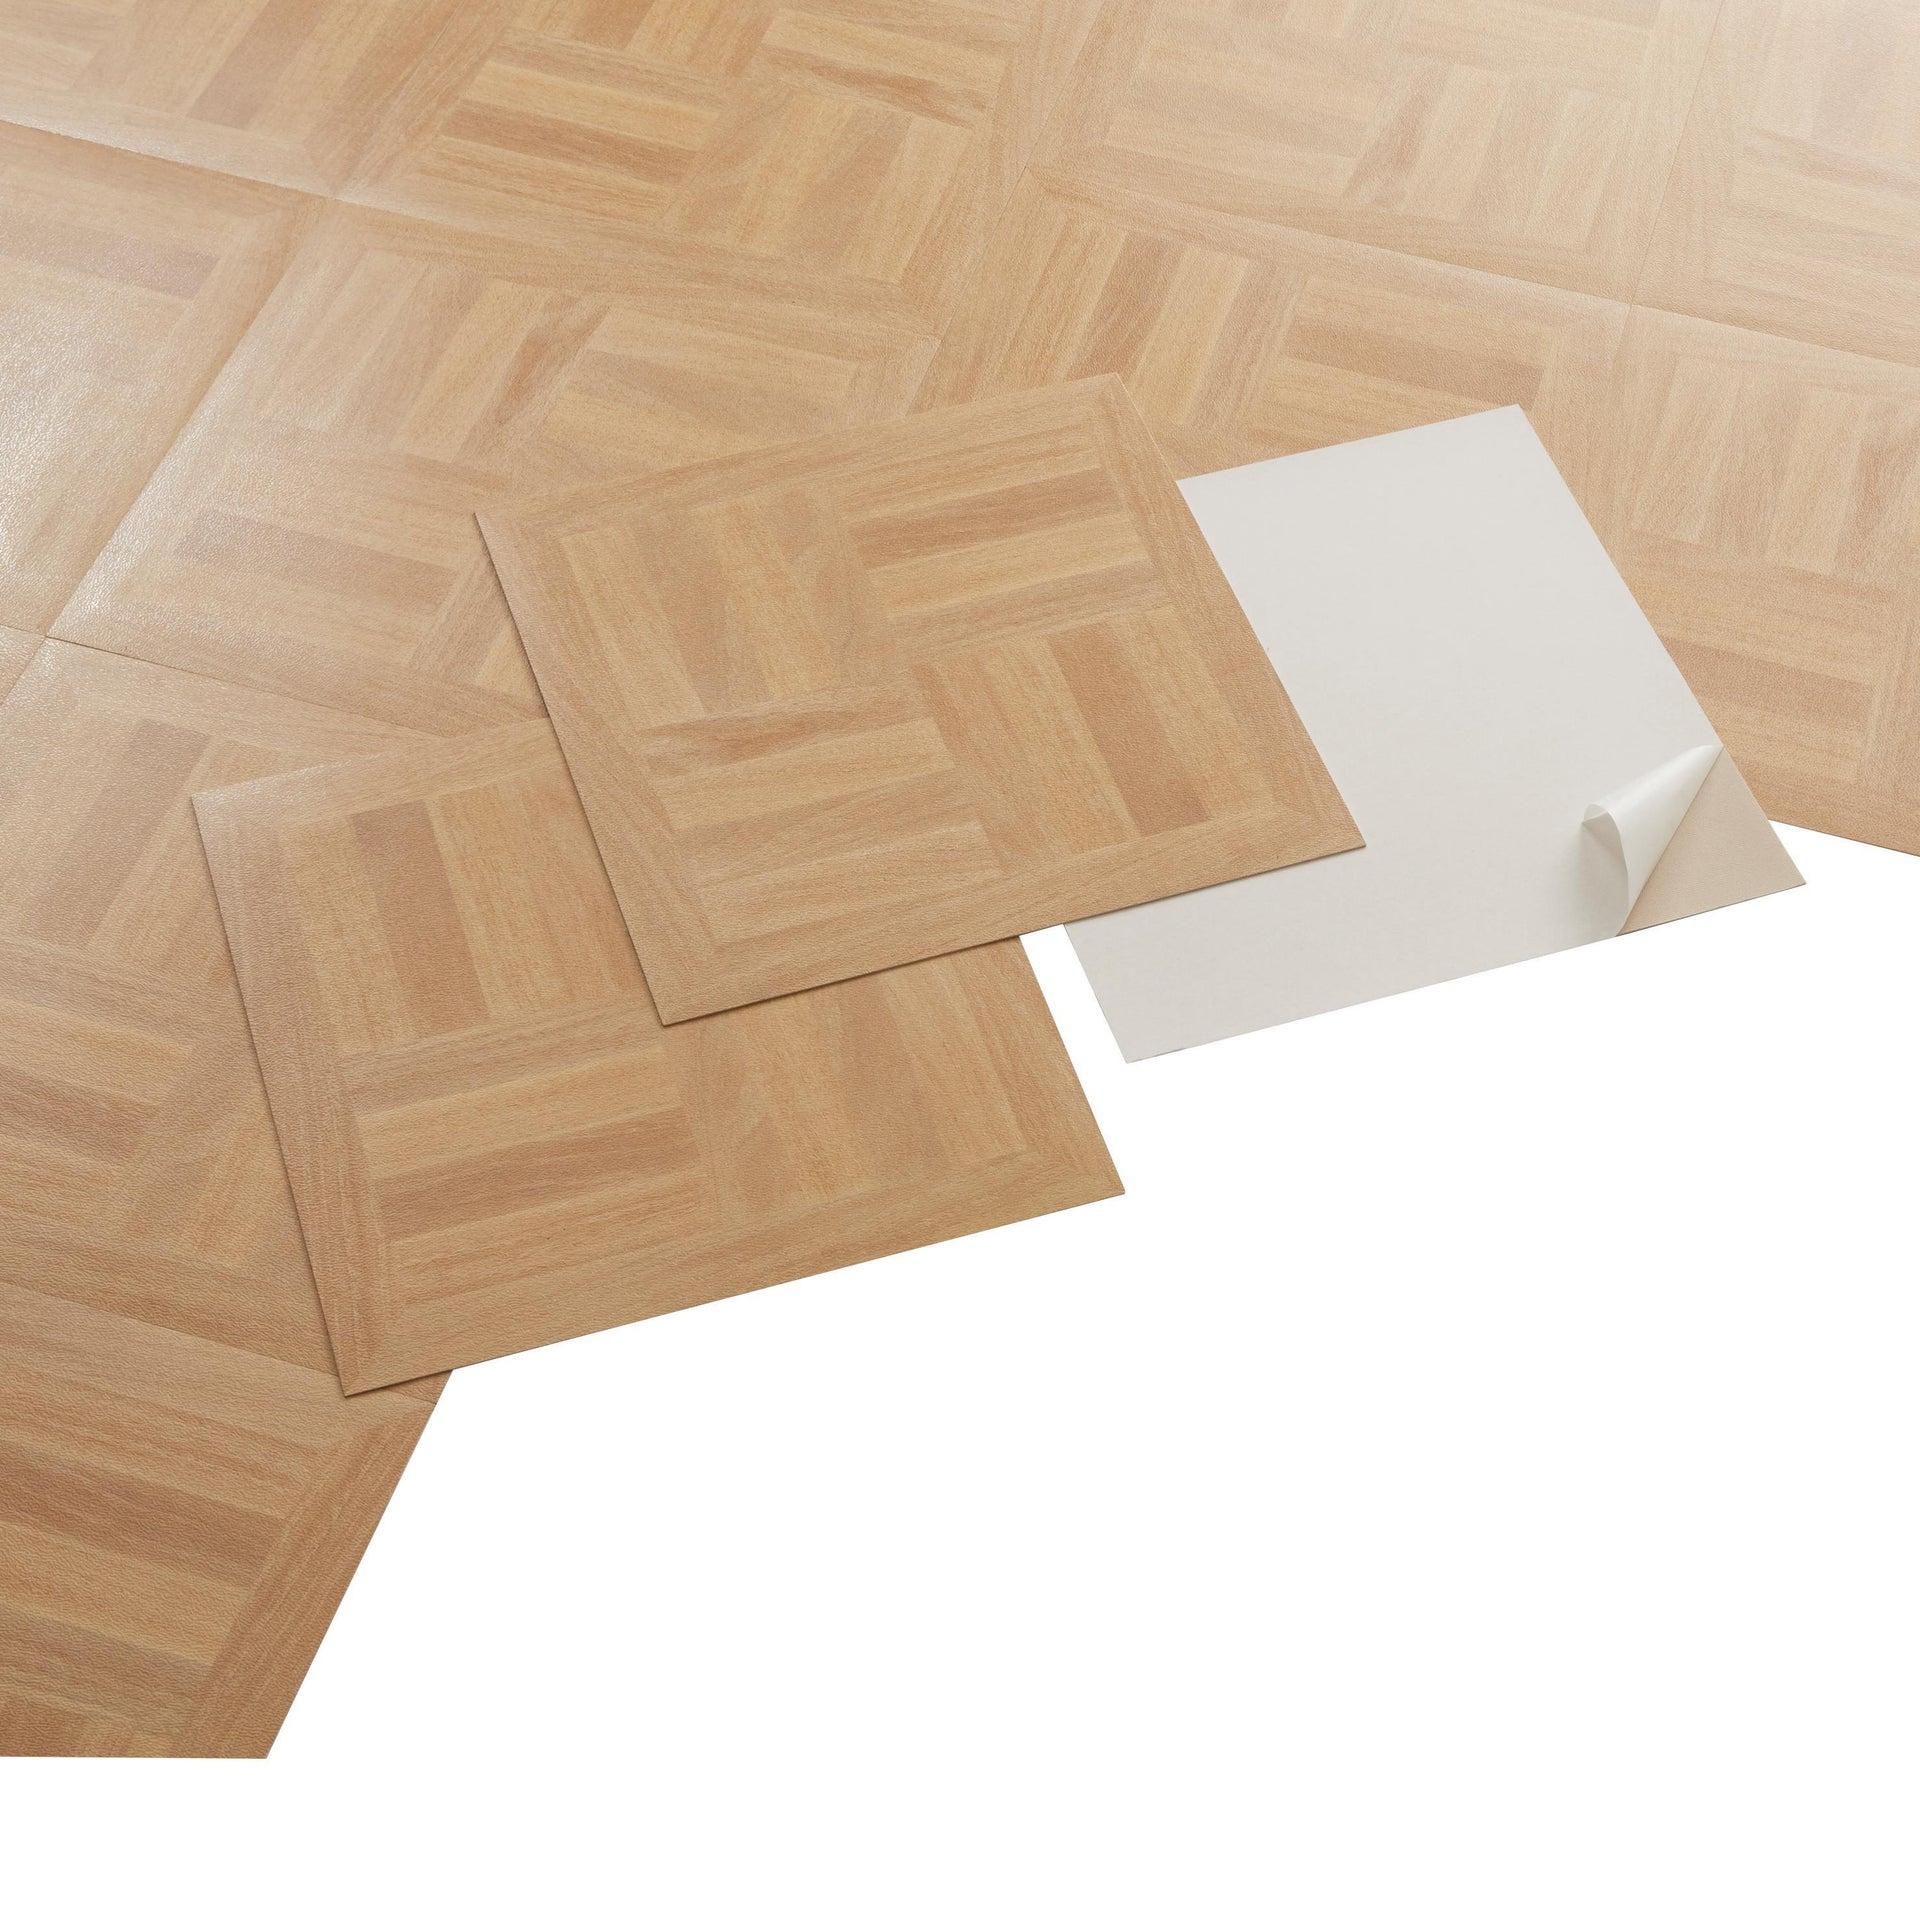 Pavimento PVC adesivo Dugan Sp 1.2 mm giallo / dorato - 3